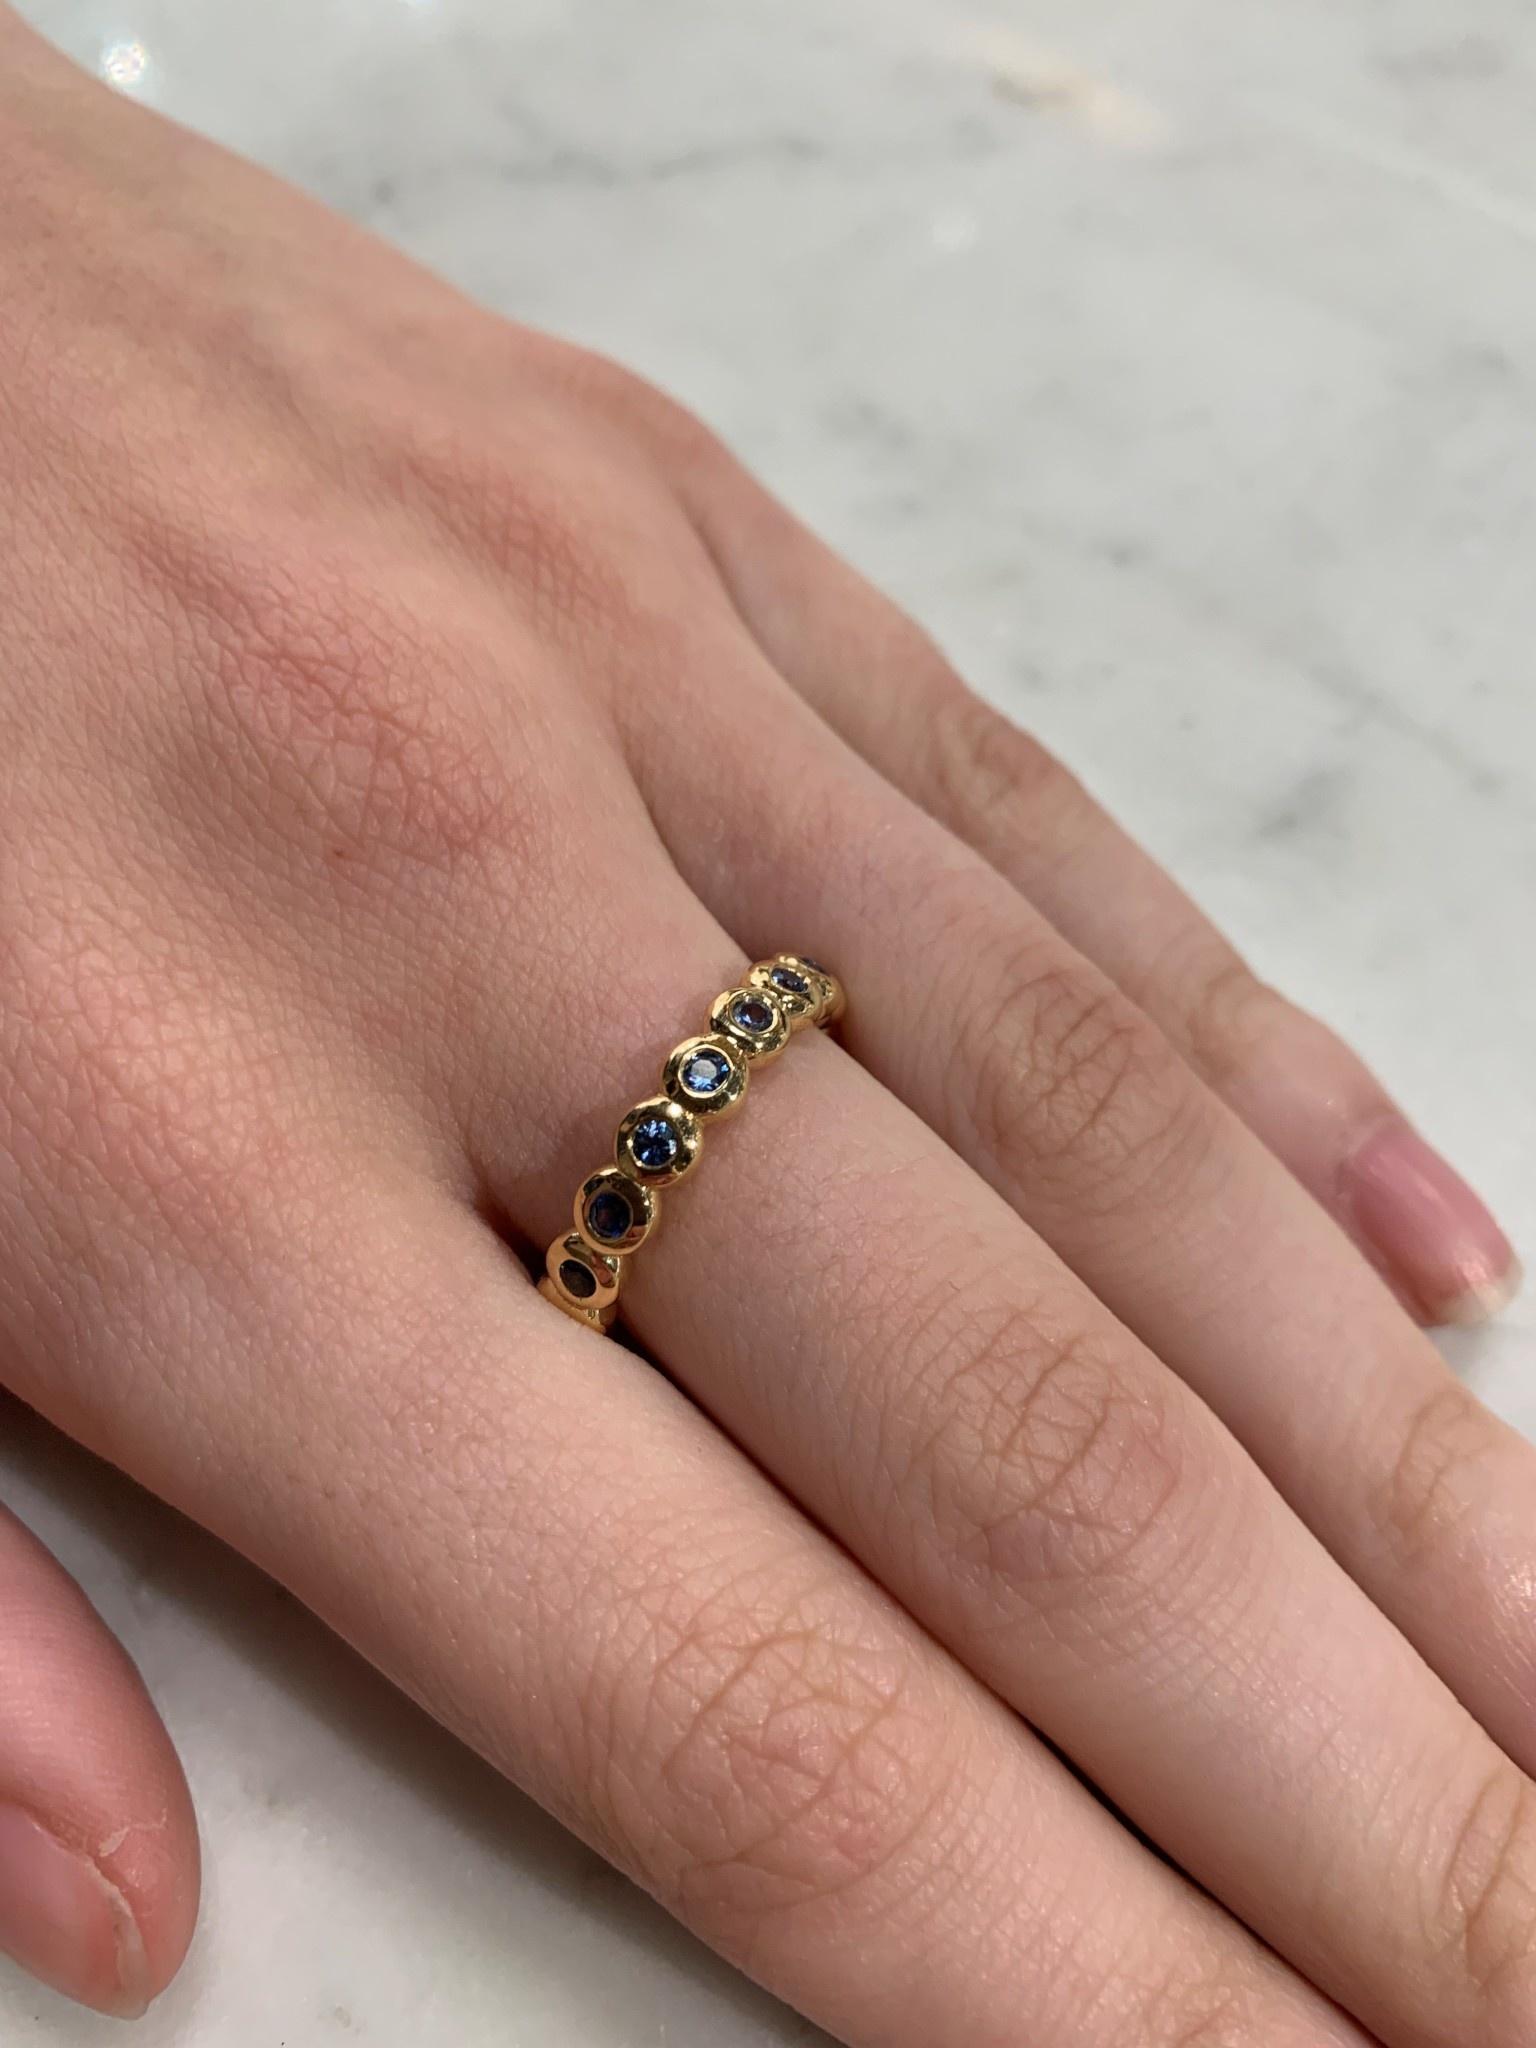 ROEMER by Bregje ROEMER by Bregje geelgouden ring met blauwe Saffier